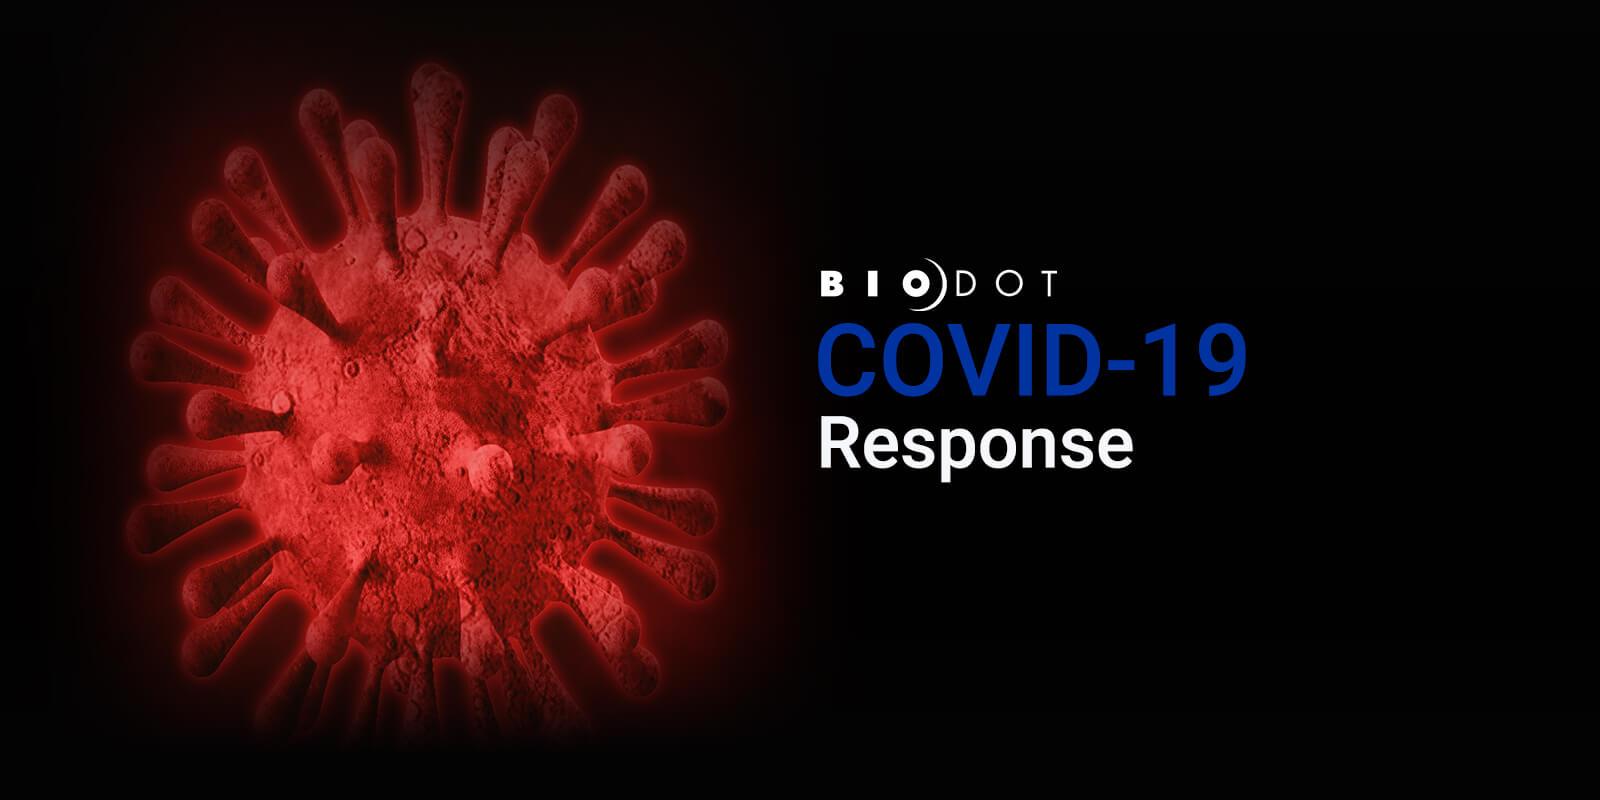 BioDot Response to COVID-19